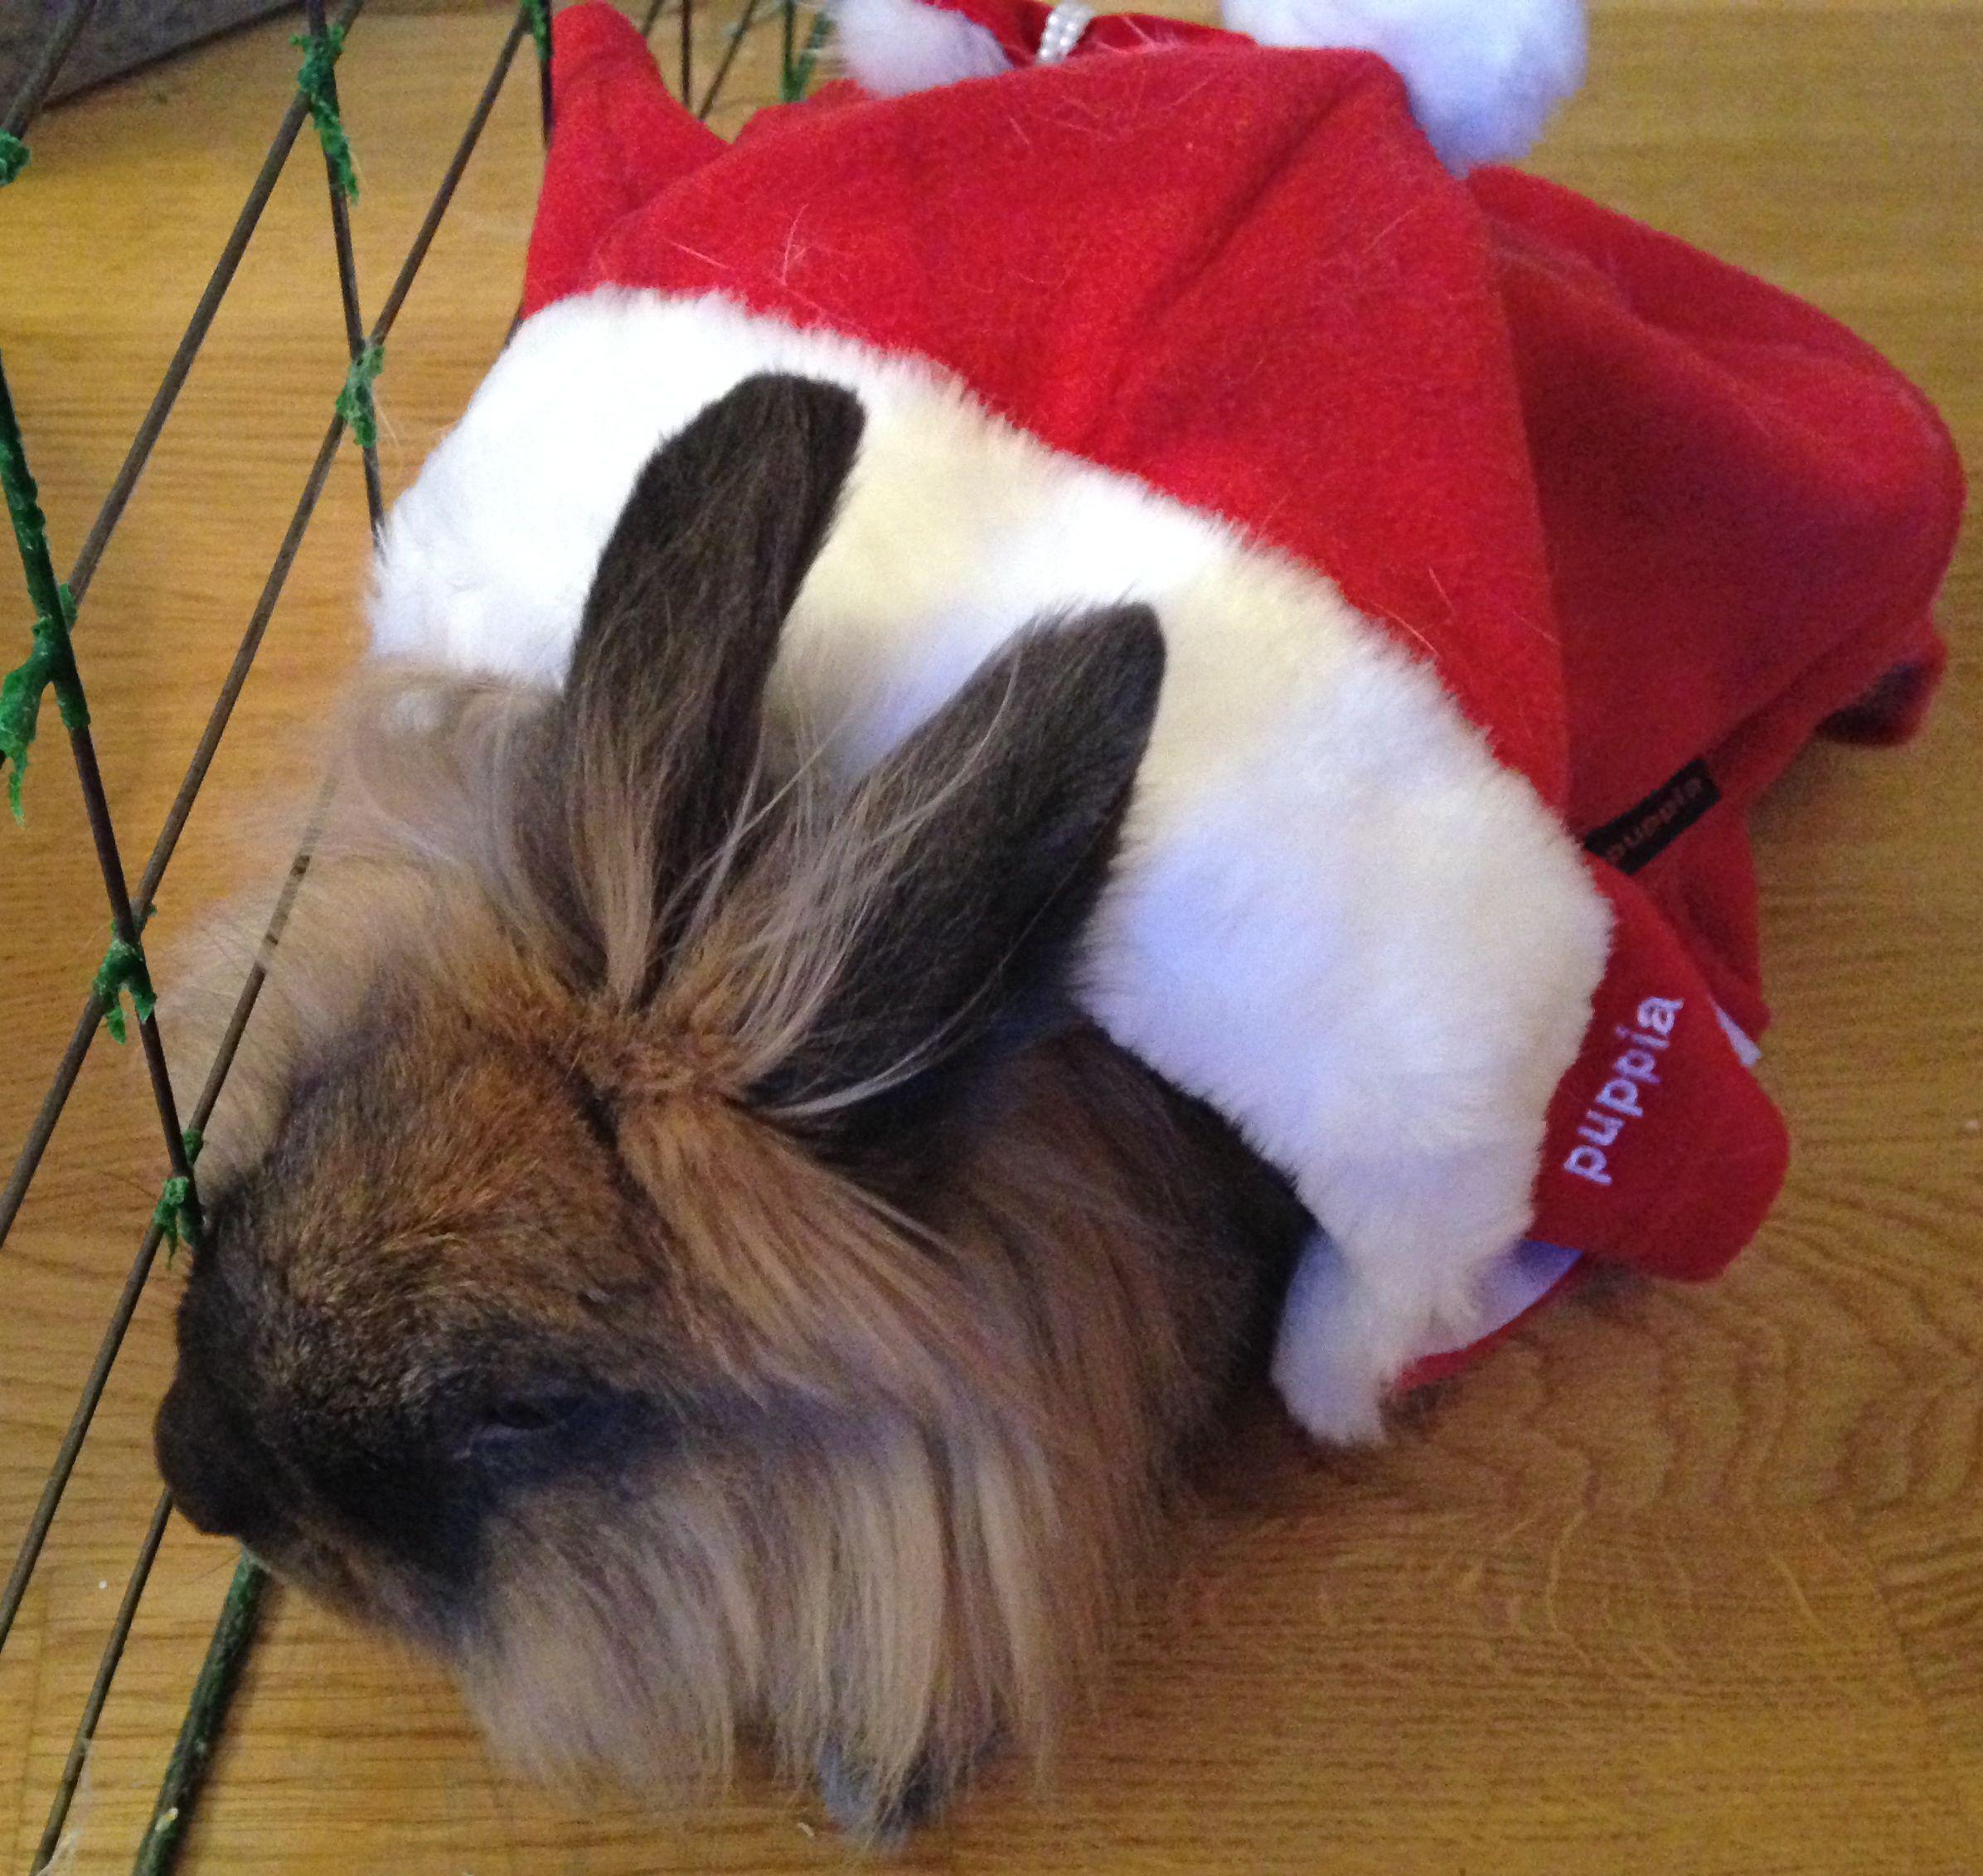 God Jul fra Dexter <3 / Merry Christmas to everybody from Dexter<3<3 2013/IJ